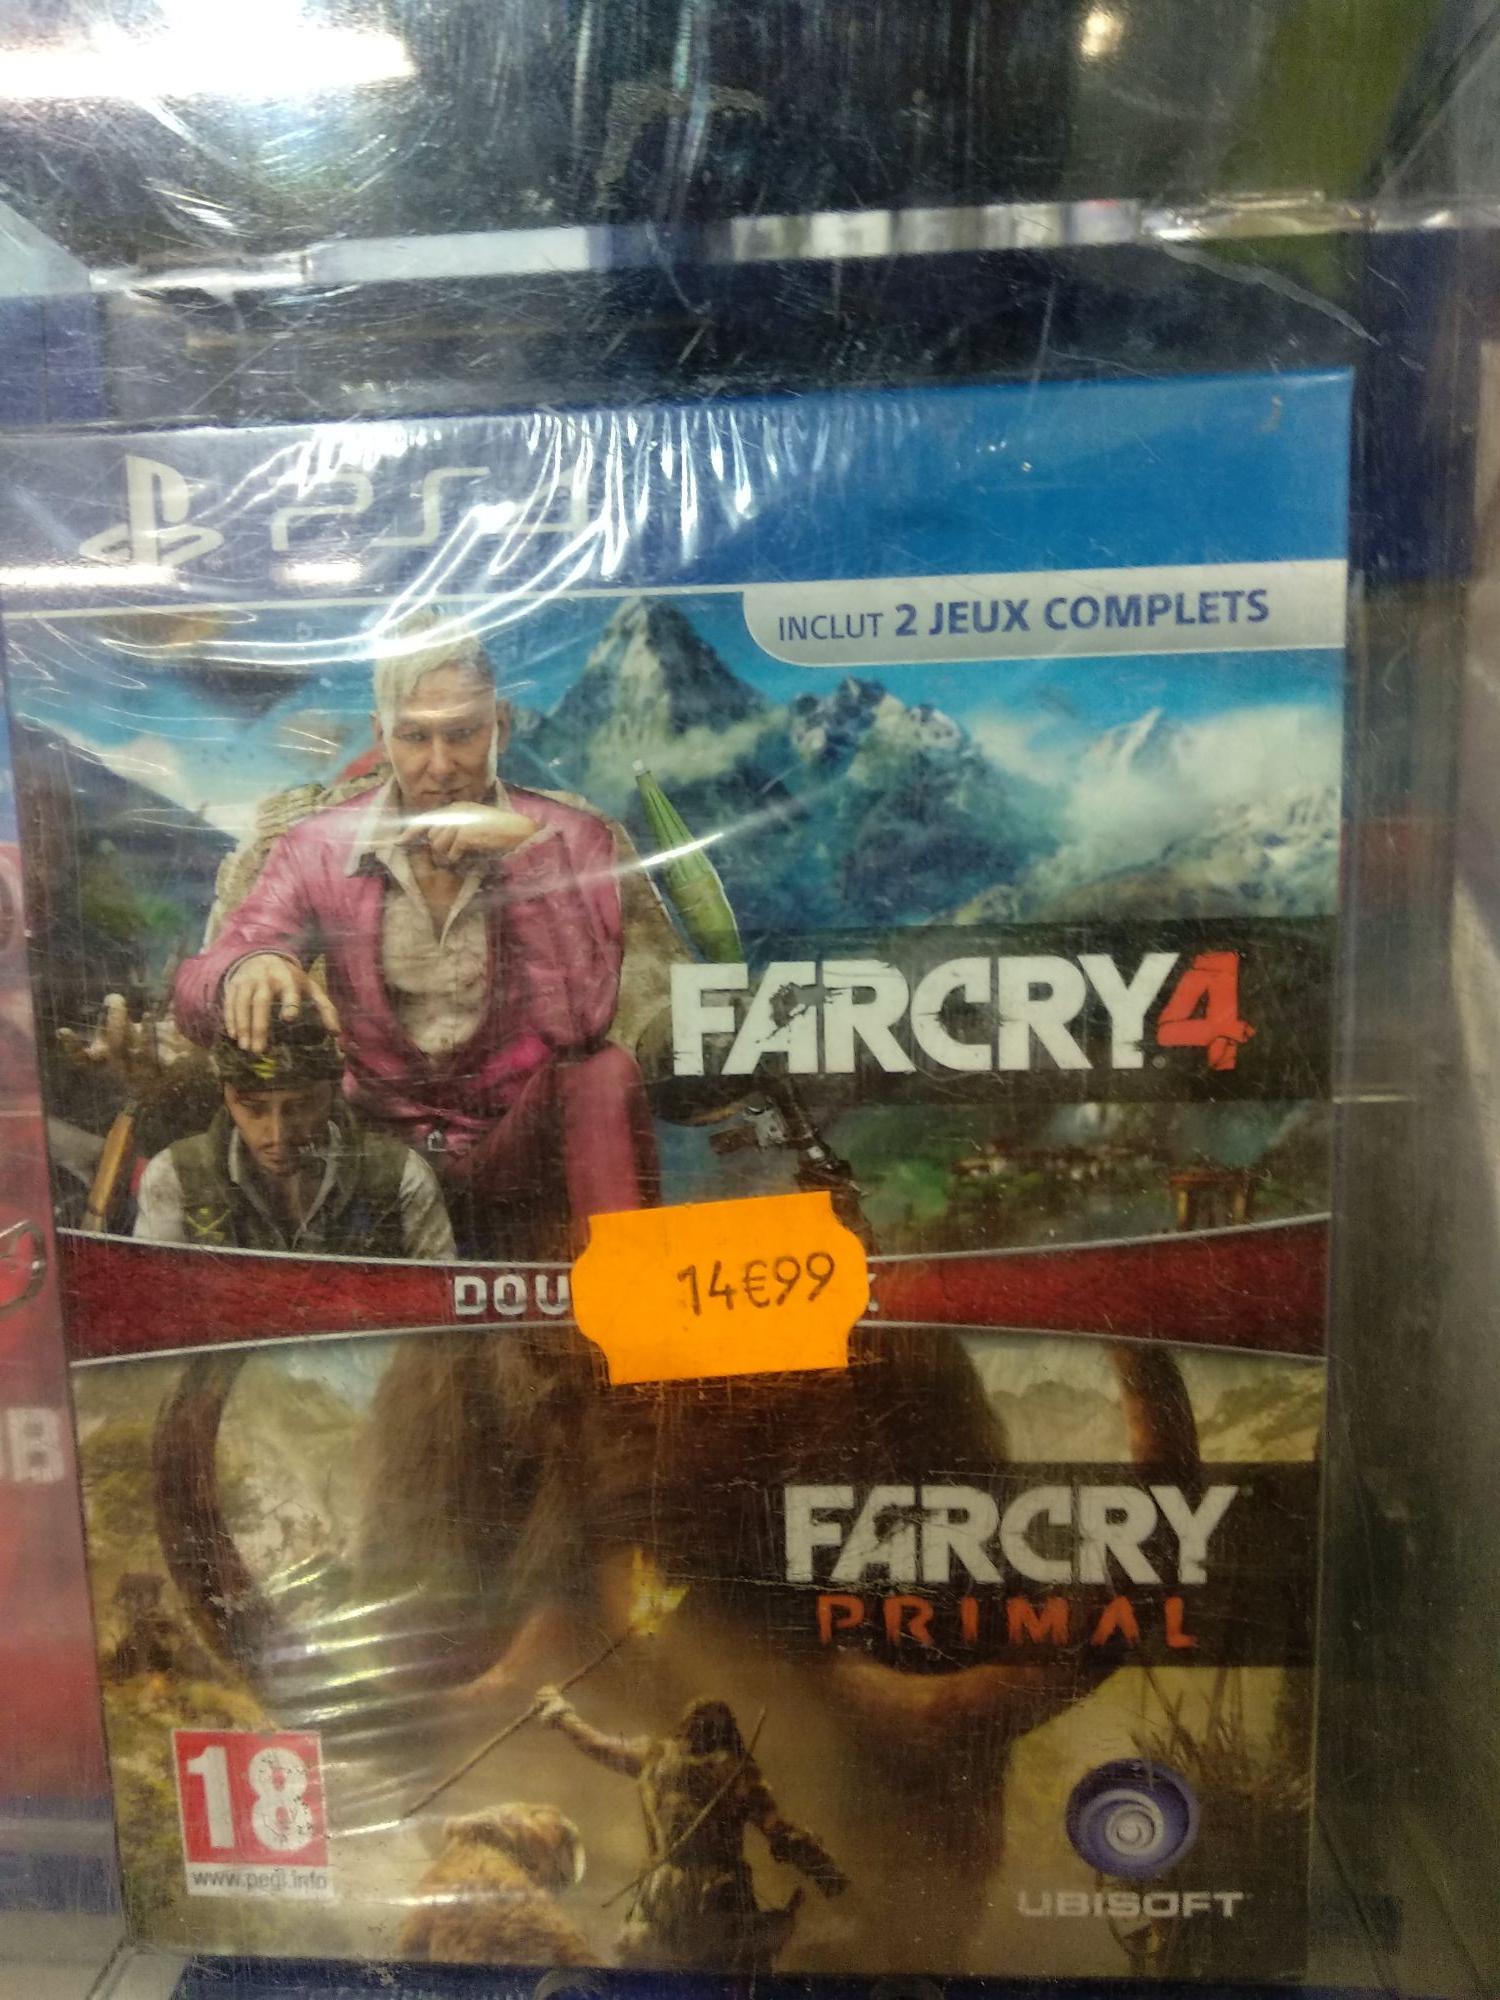 Bundle Far Cry Compilation - Far Cry 4 + Far Cry Primal sur PS4 - Marsac-sur-l'Isle (24)